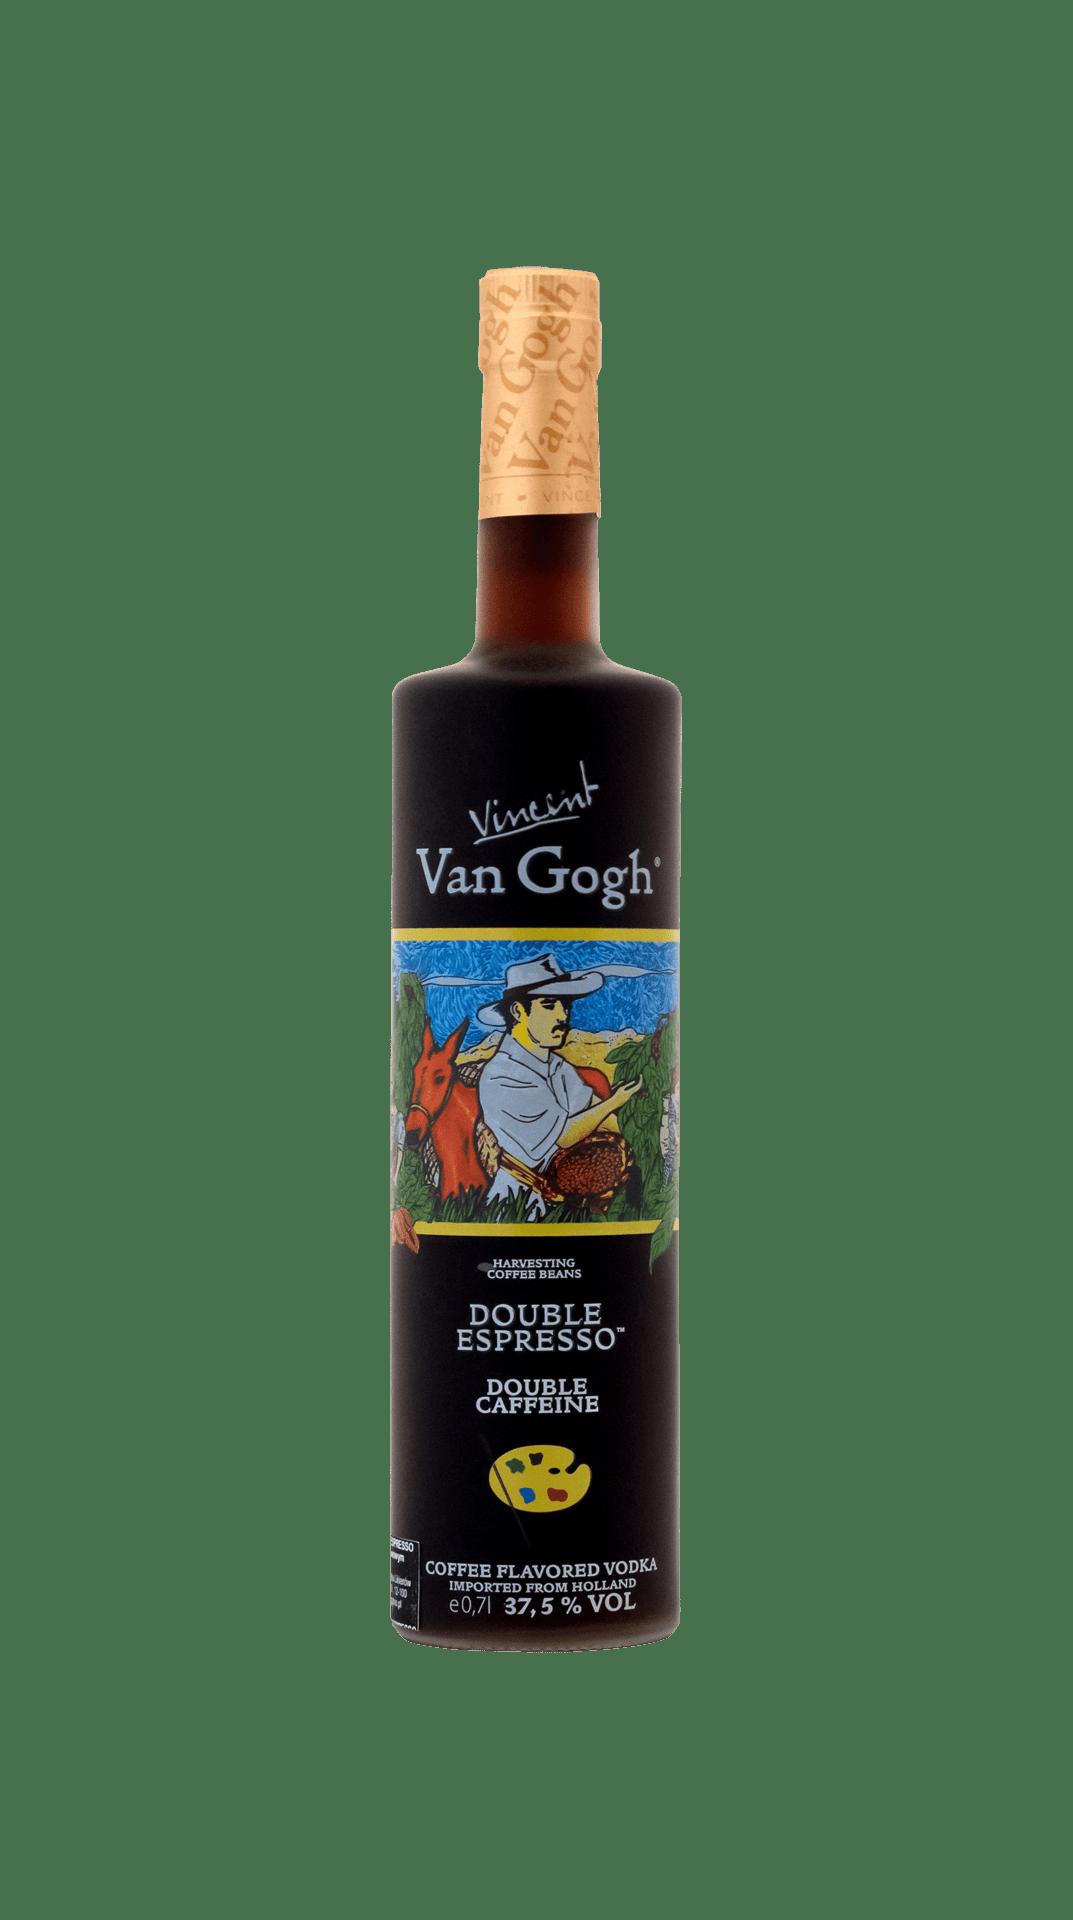 Van Gogh Double Espresso 0,7l